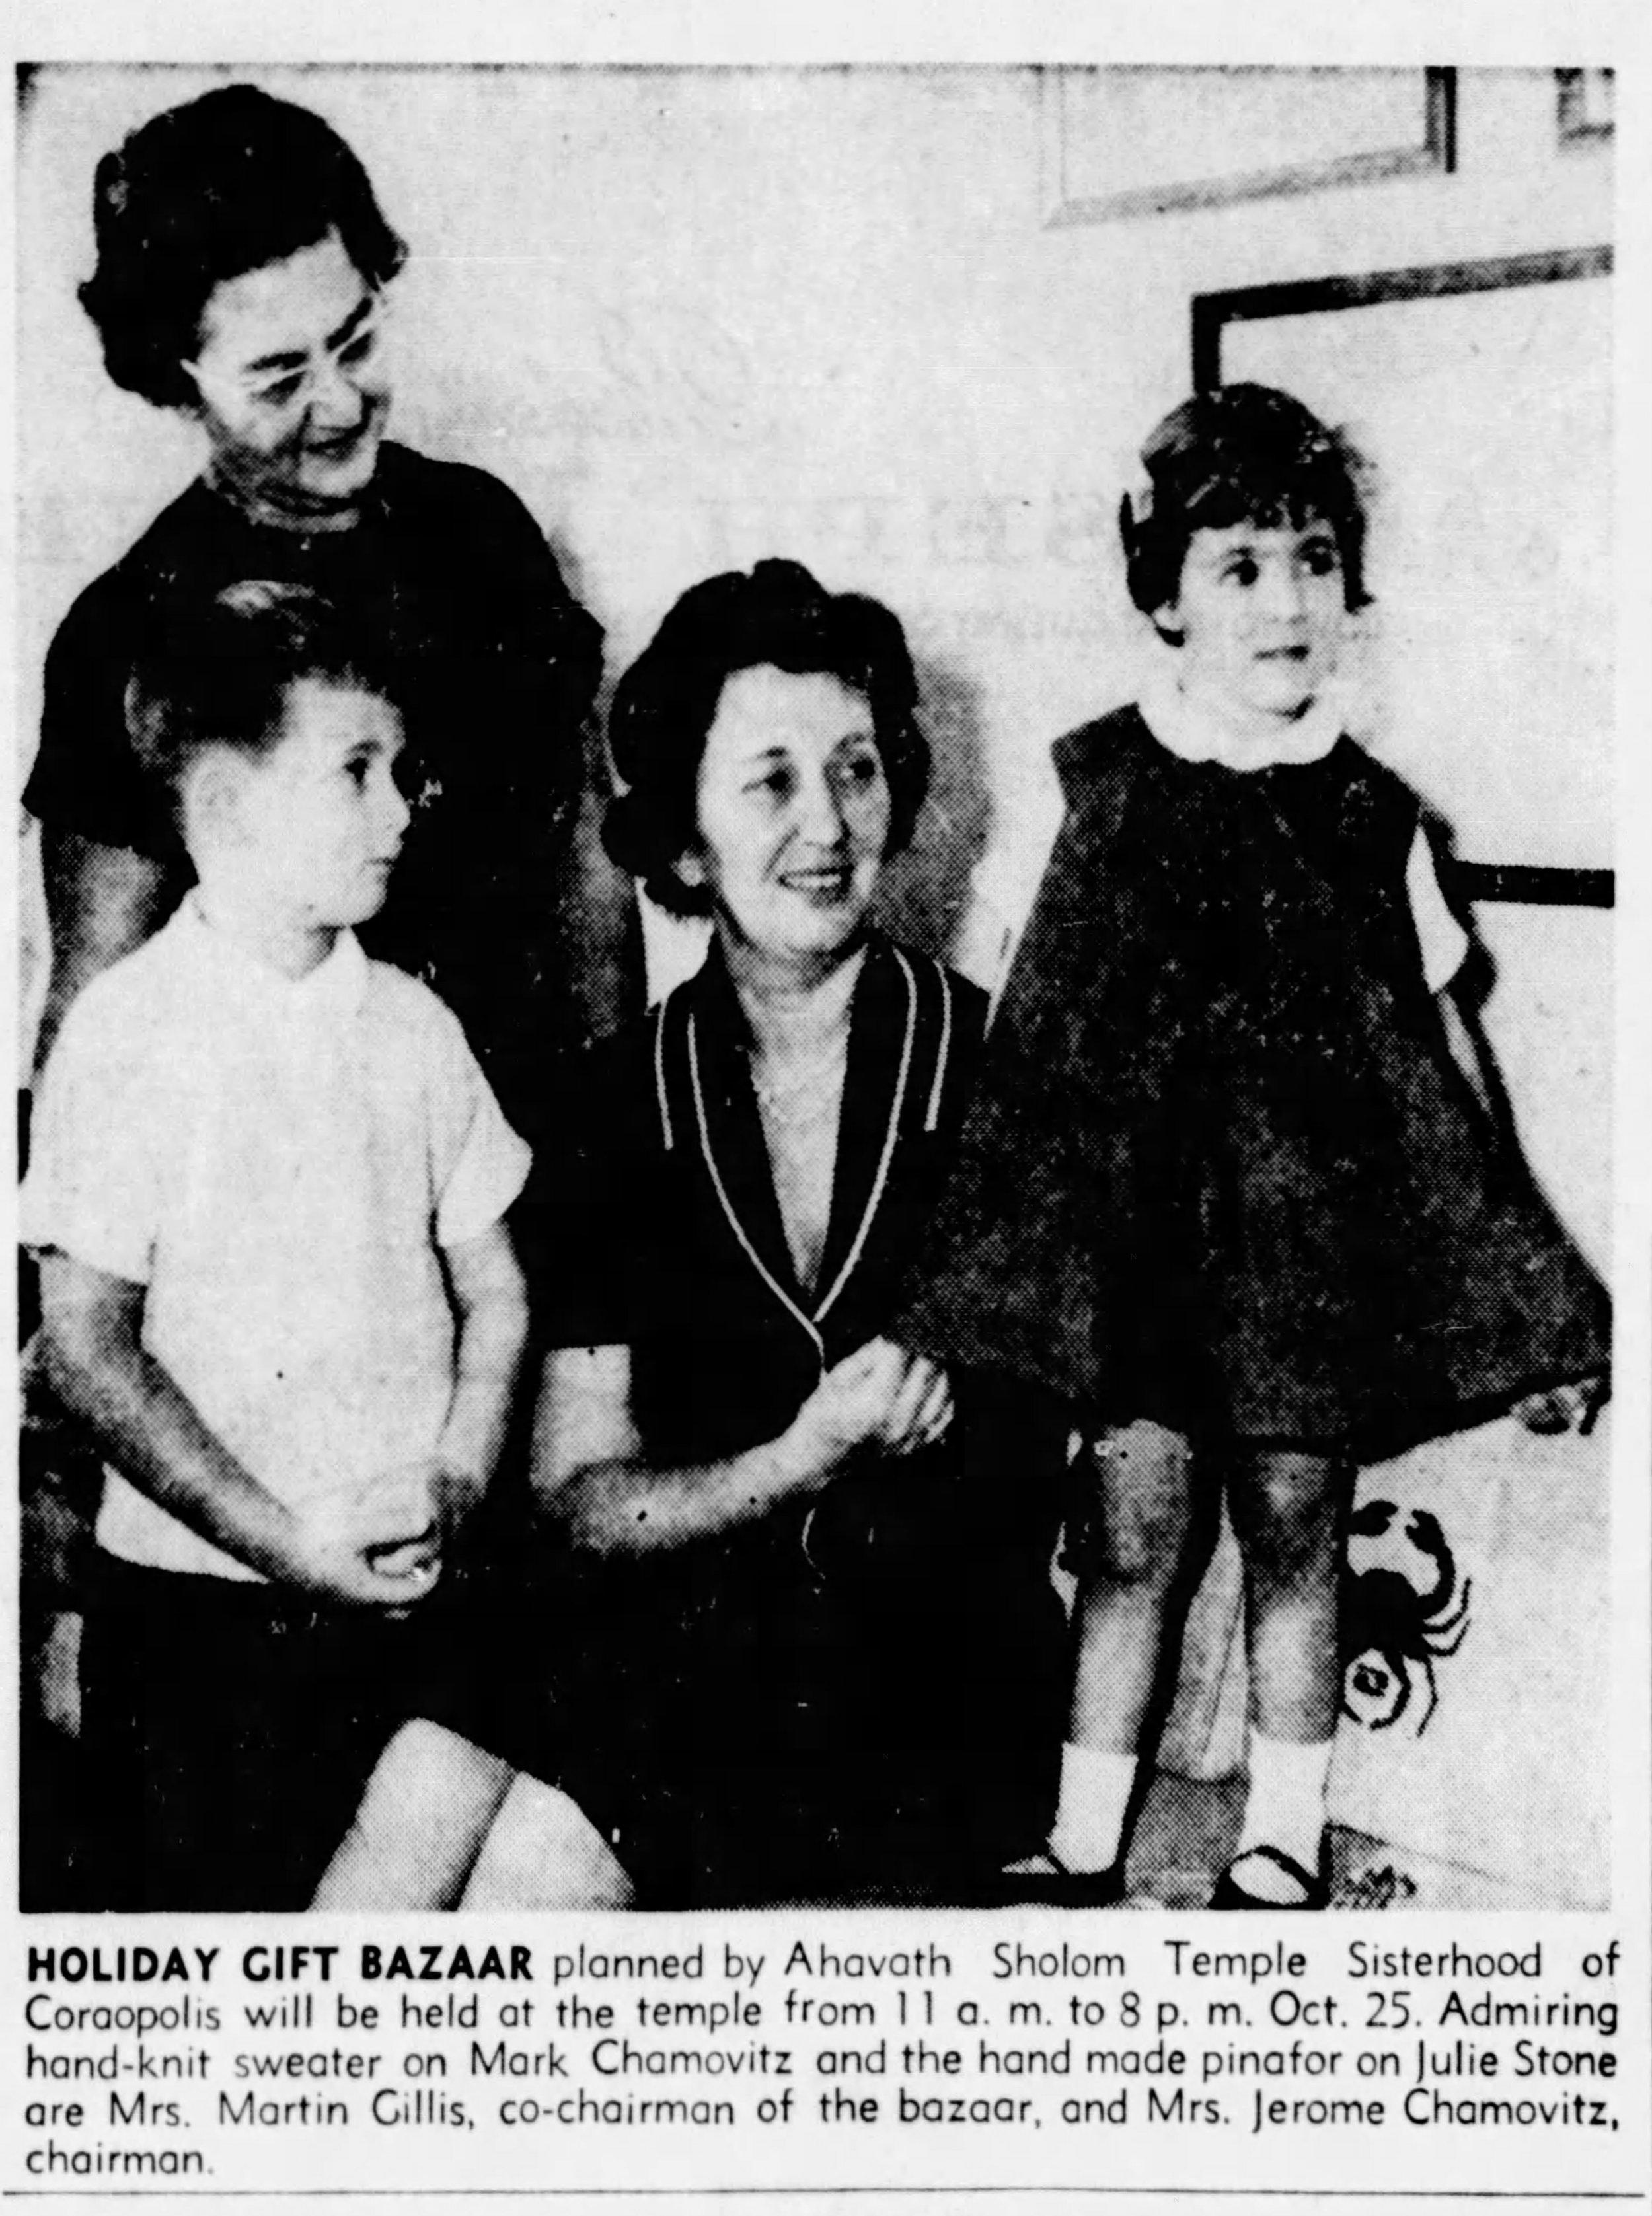 1962-10-16 The Pittsburgh Press (v79, n114, p28)